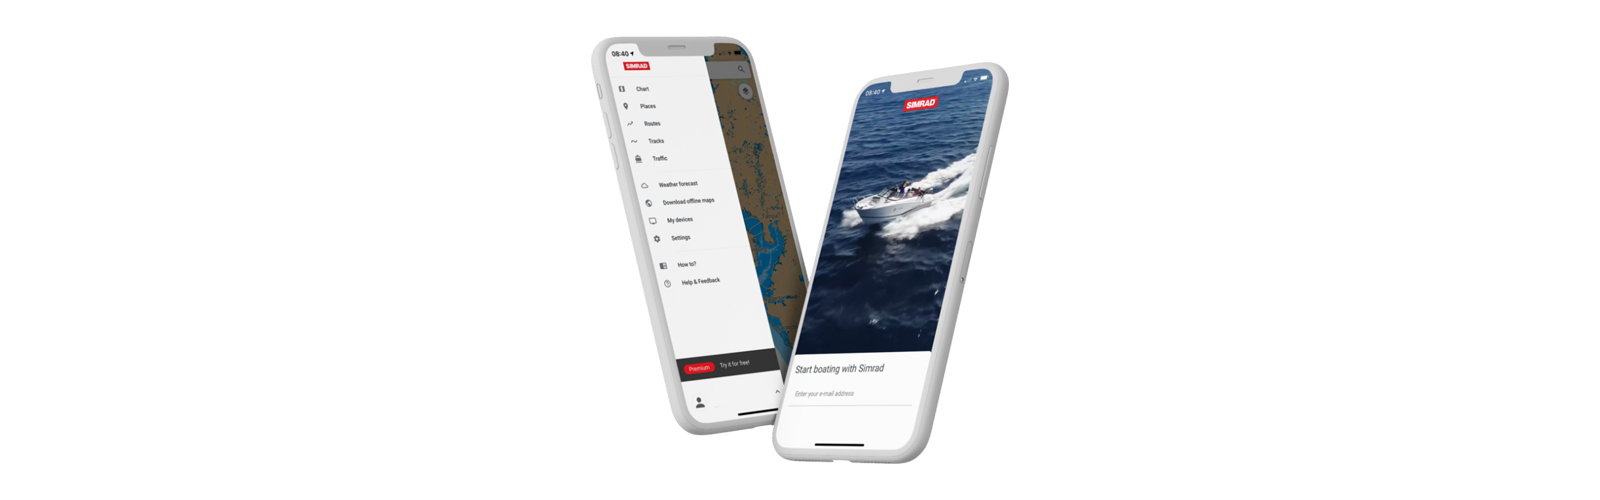 simrad-app.jpg